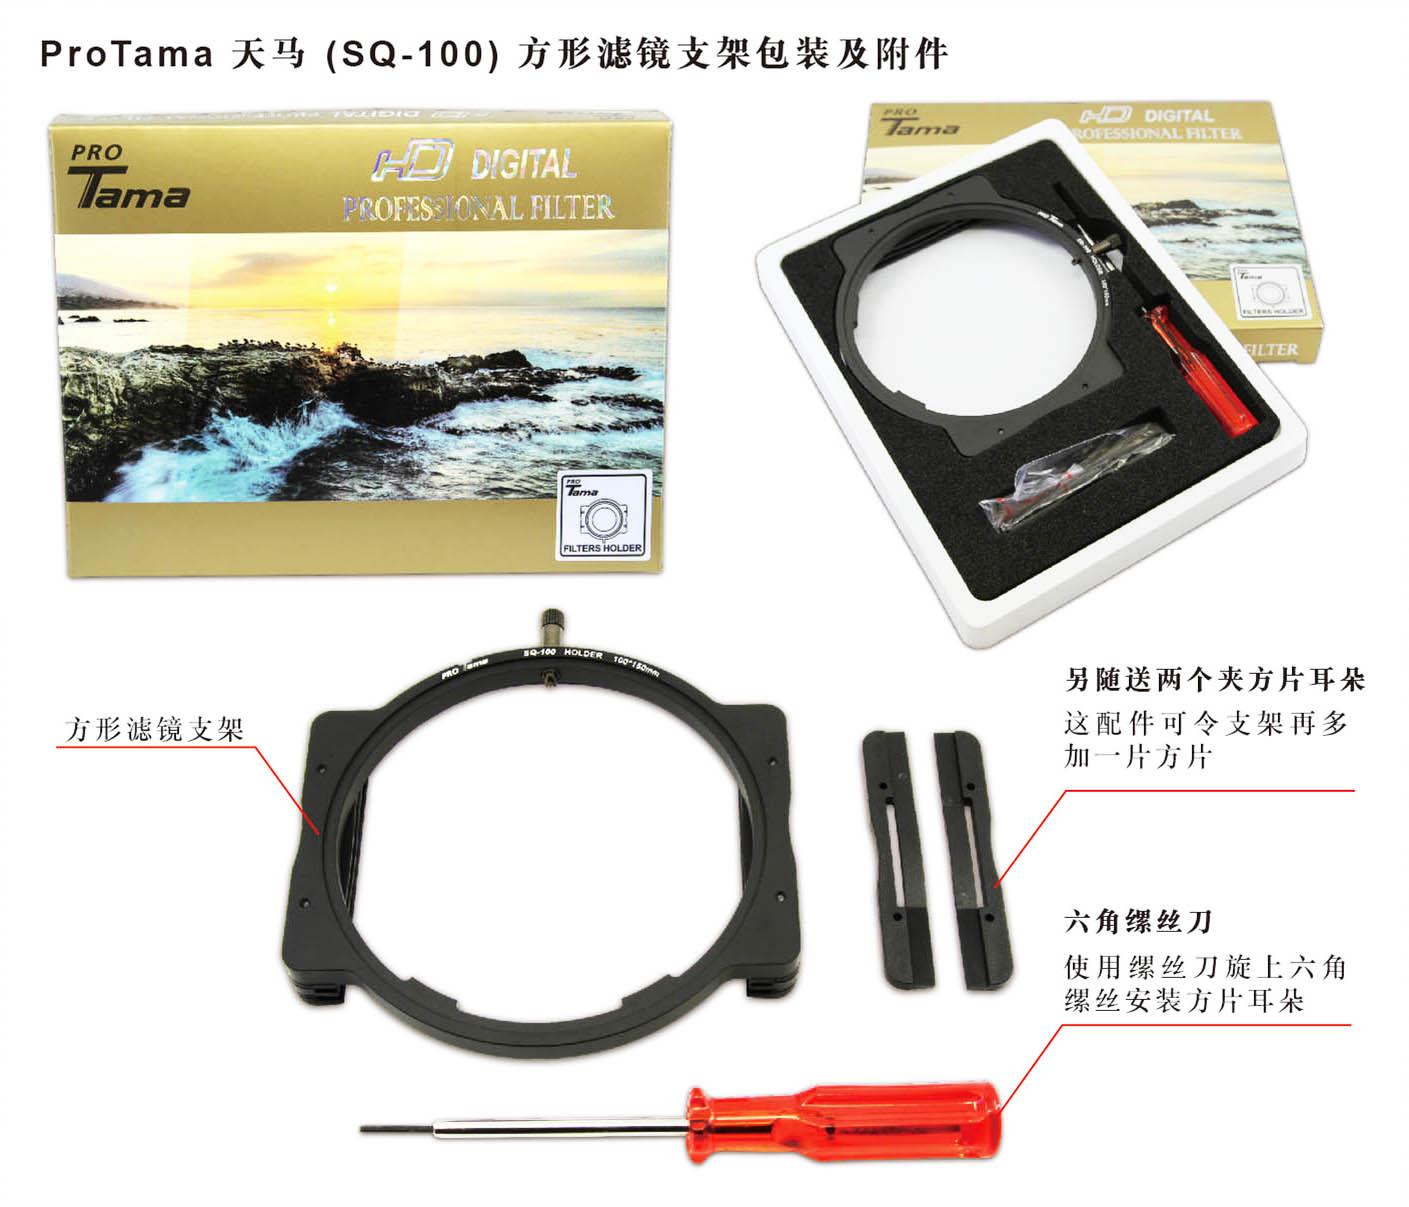 ProTama 天馬 (SQ-100) HD 高清方形濾鏡支架包裝 - 內附兩個方片耳朵夾及一個六角縲絲刀